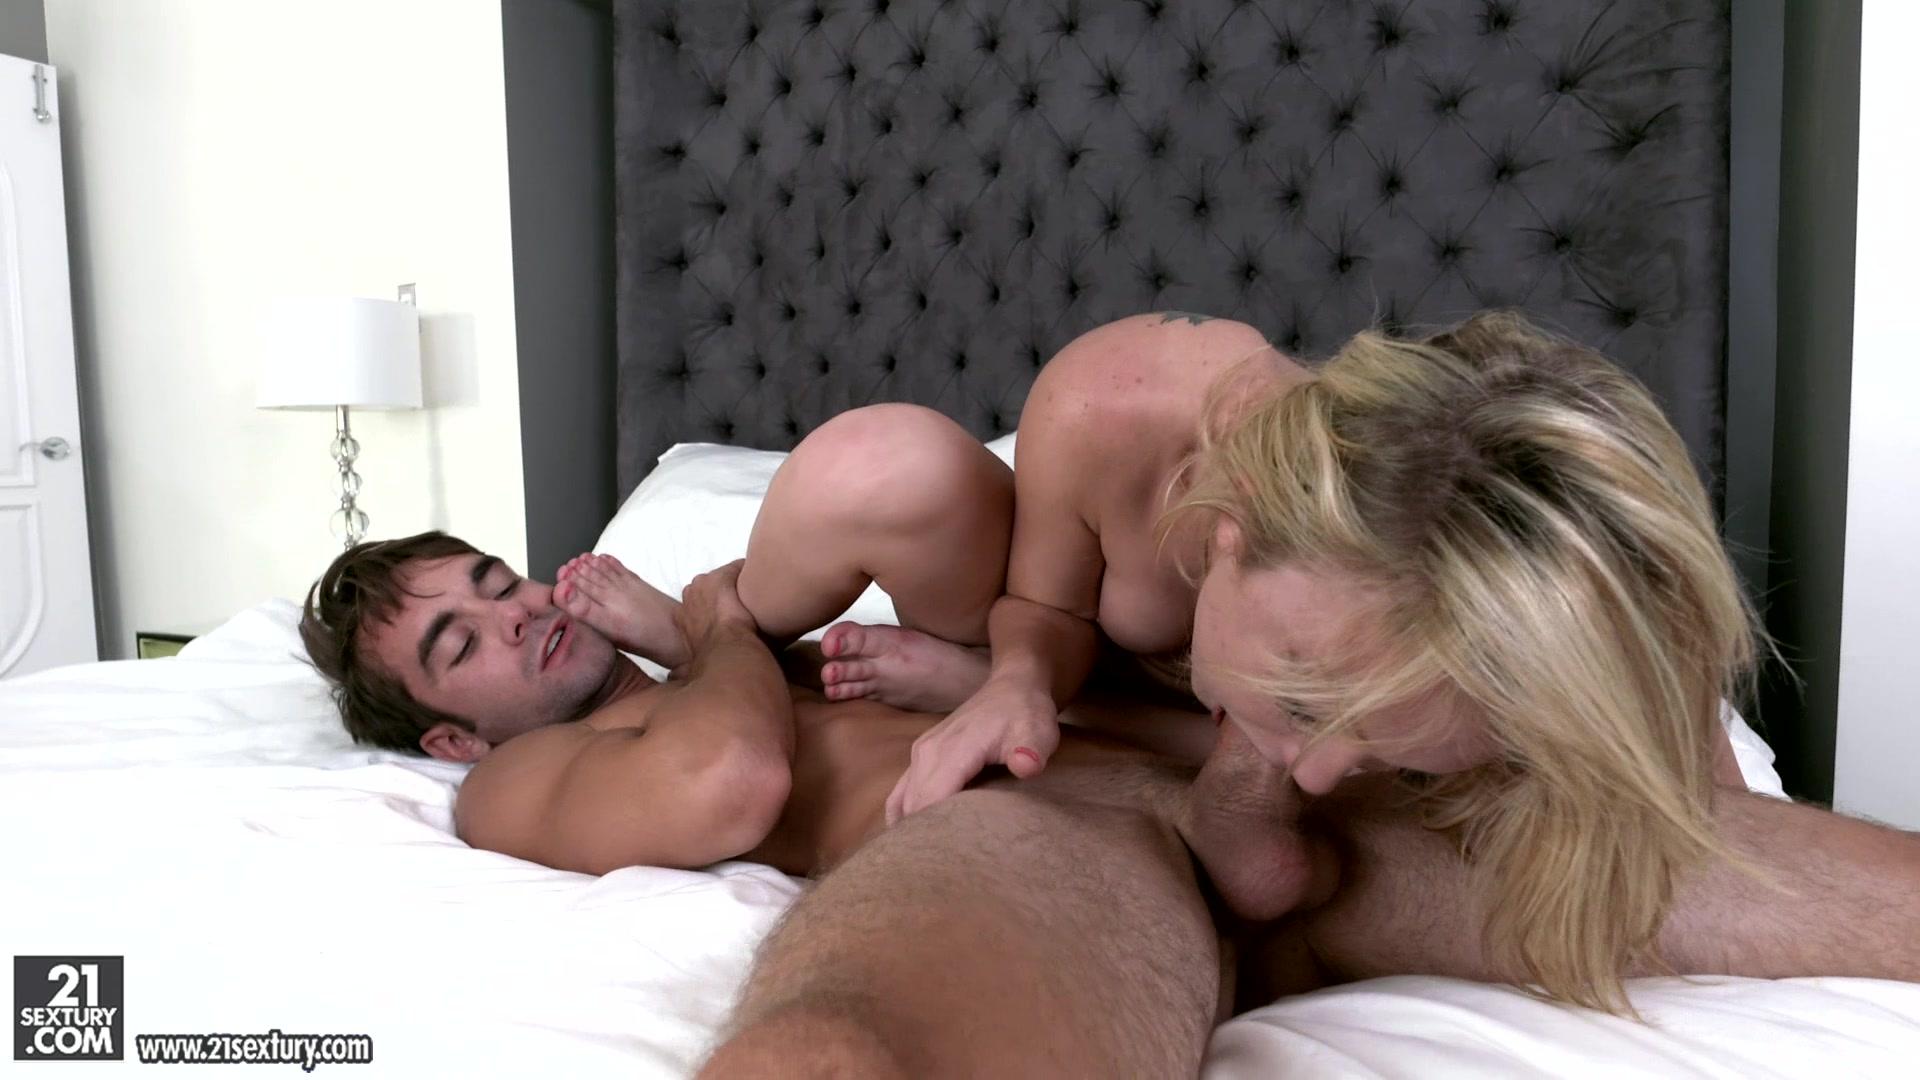 Порно разбудил зрелую 6 фотография